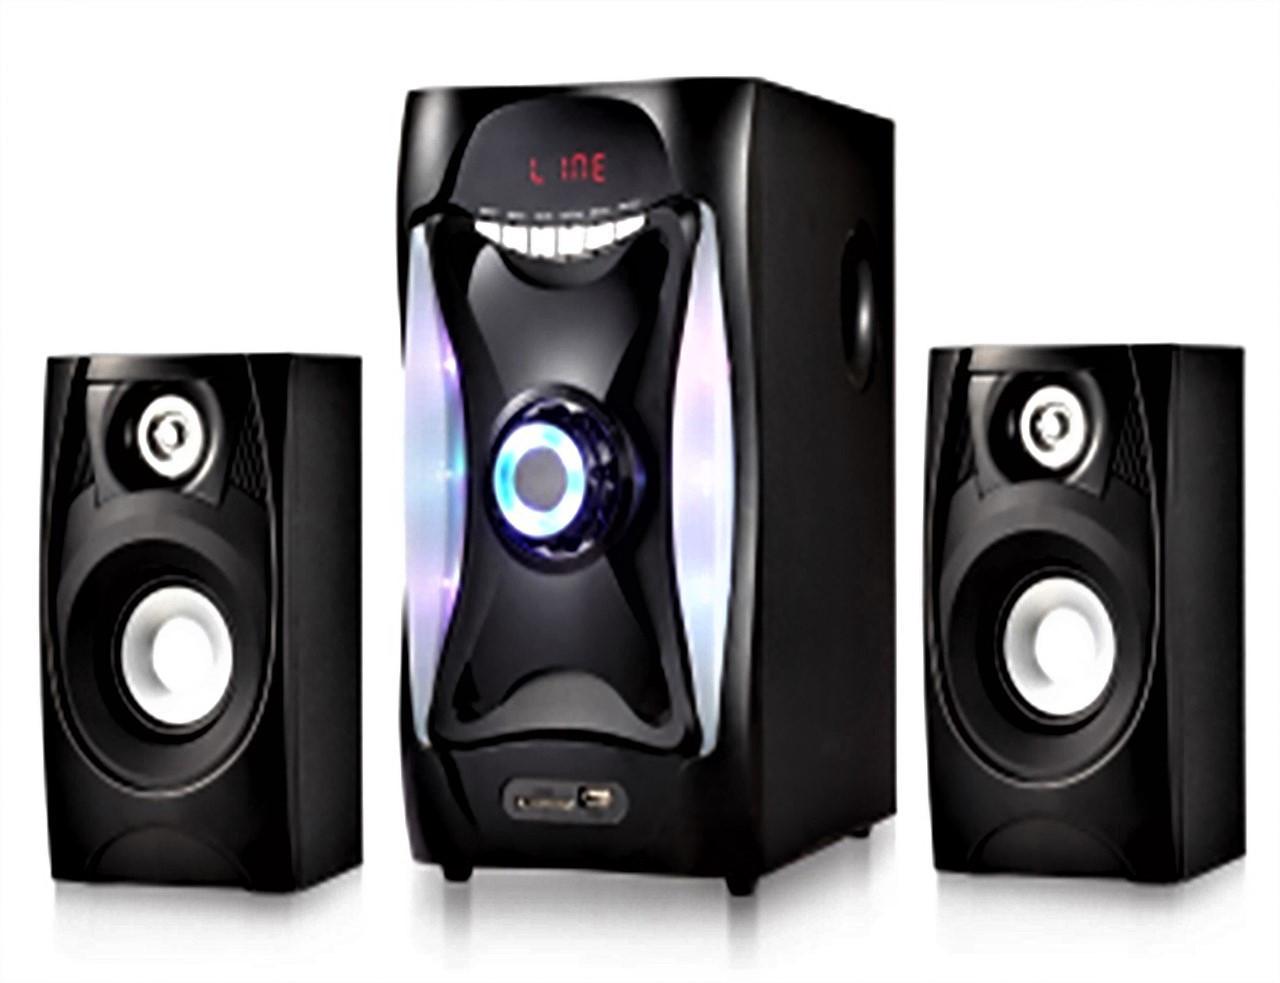 Акустична Система 2.1 Era Ear E-112 | професійна акустична потужна колонка | домашній кінотеатр